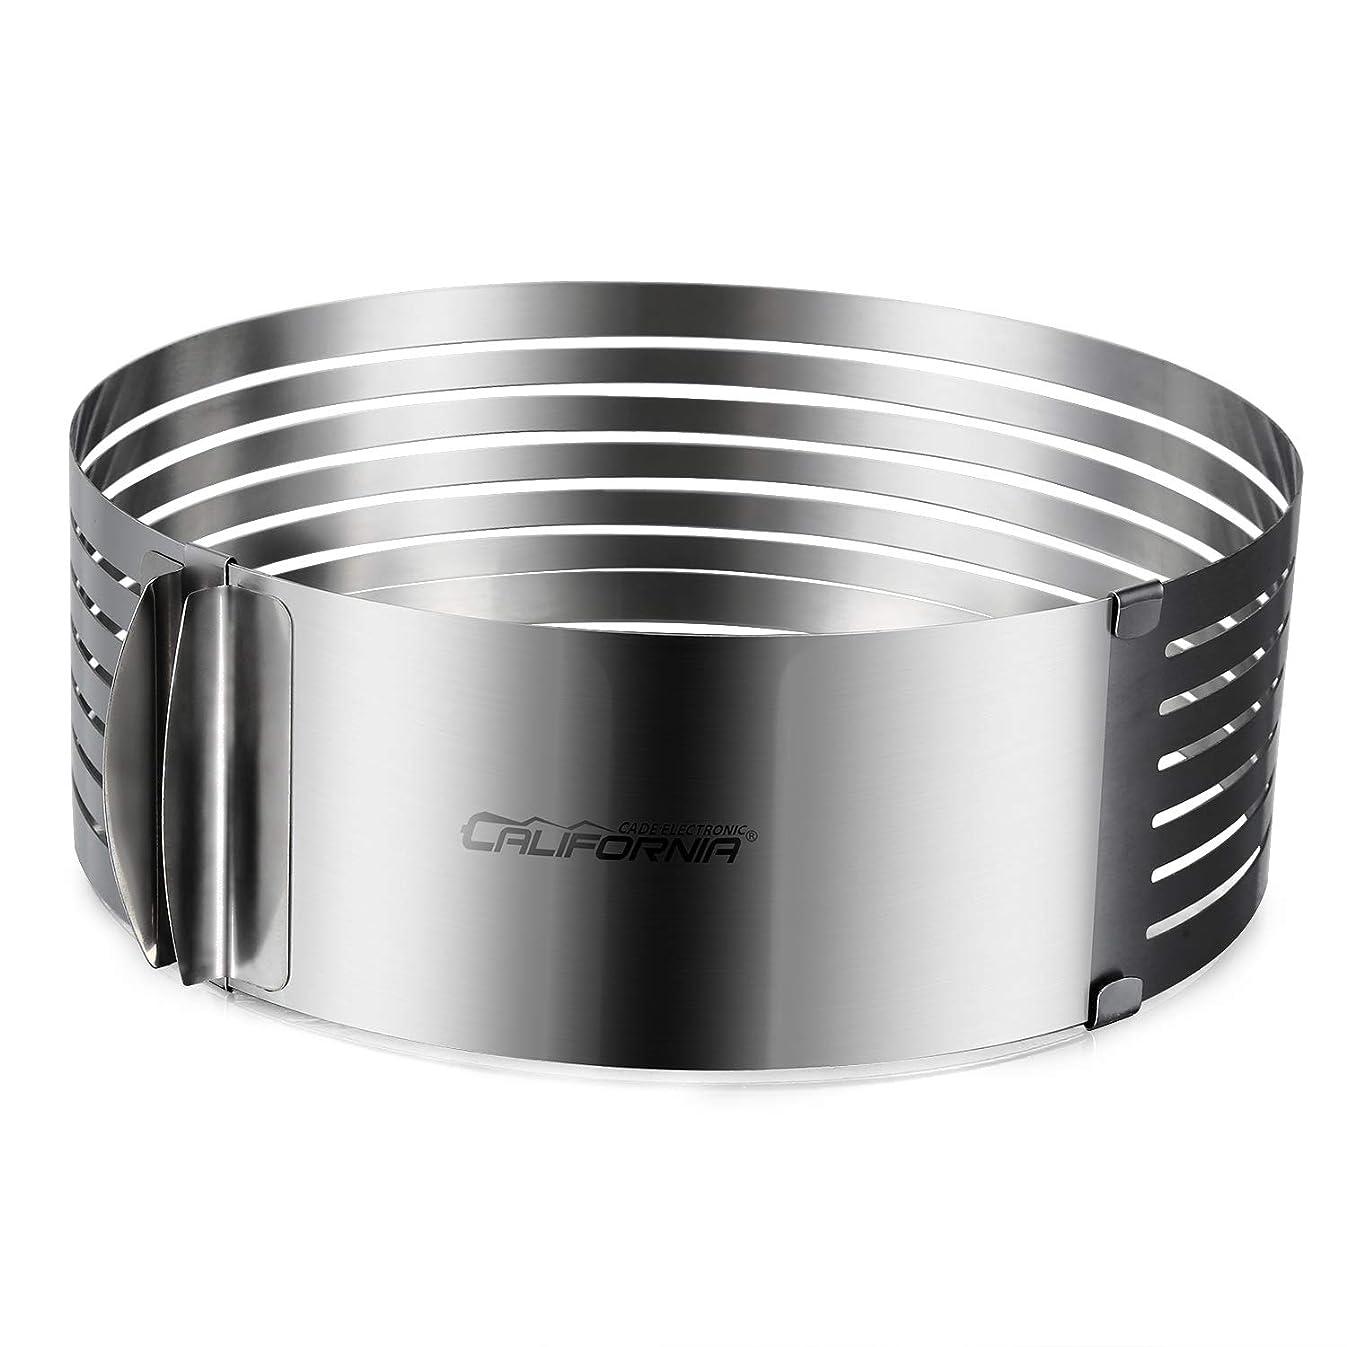 Cade Cake Leveler-Cake Slicer -Cake Mold Adjustable Stainless Steel Cake Ring-Cake Layer Slicer (Silver)